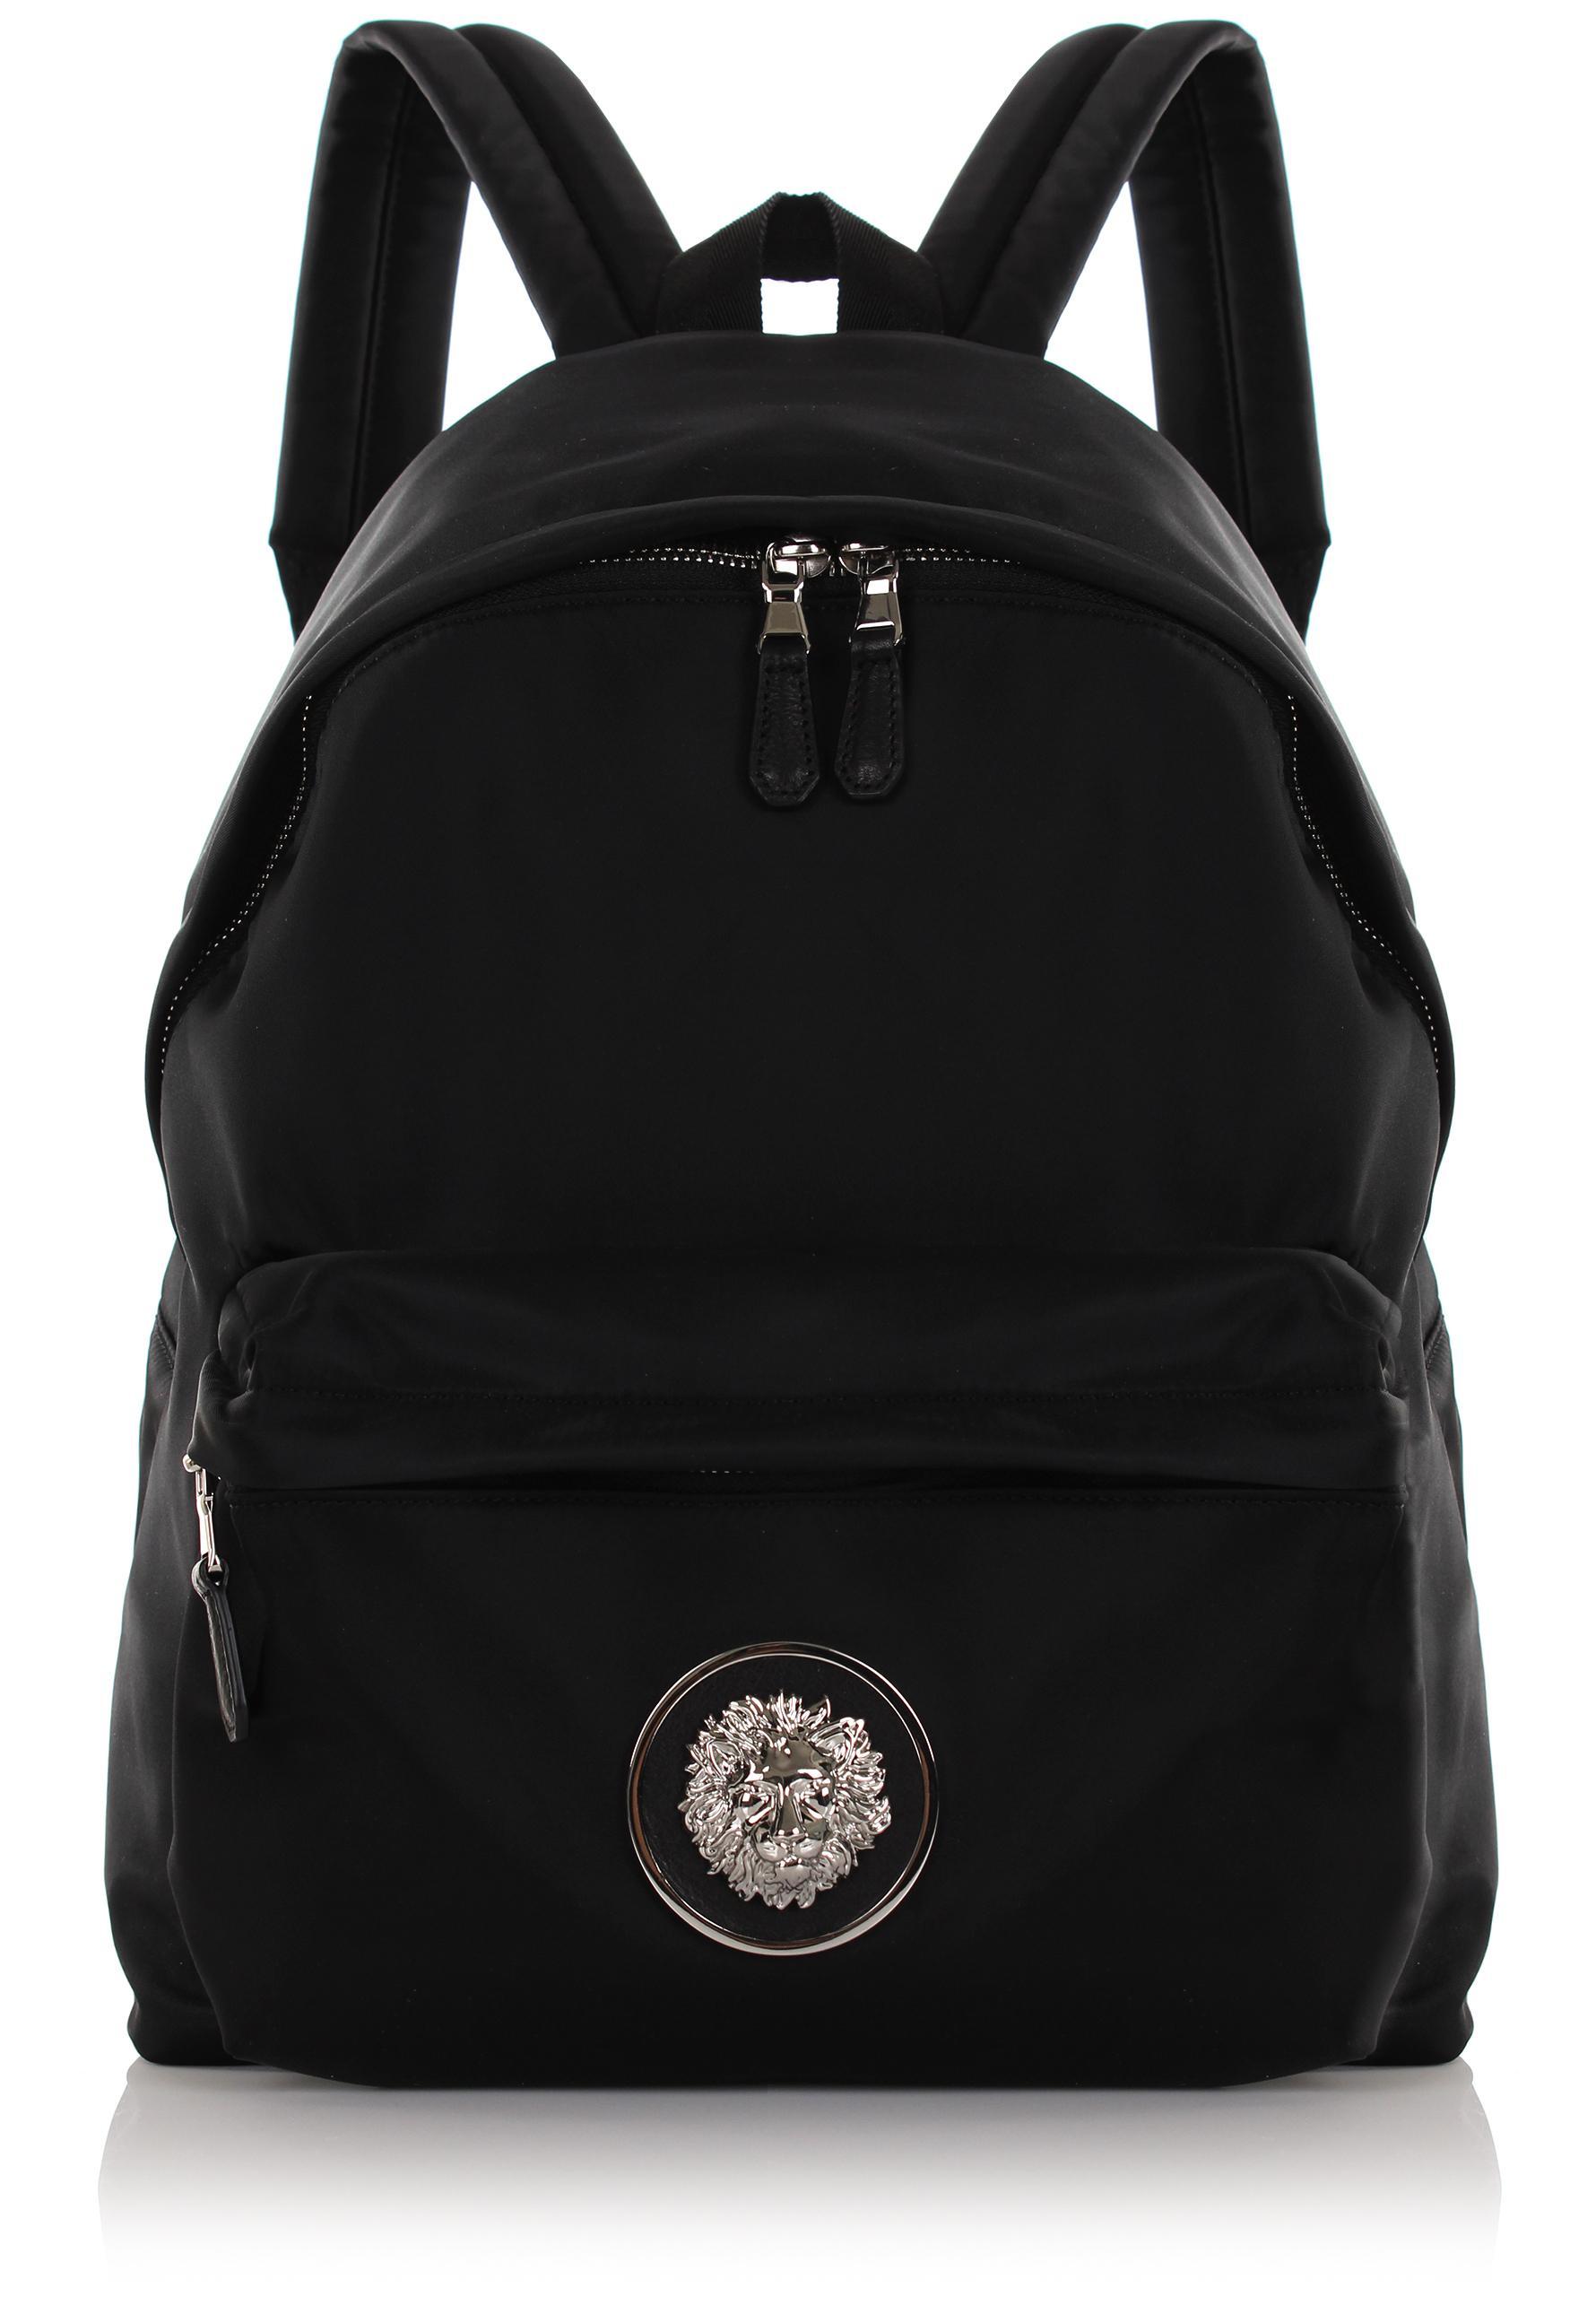 Lyst - Versus Nylon Lion Head Backpack Black in Black 3673947f49097